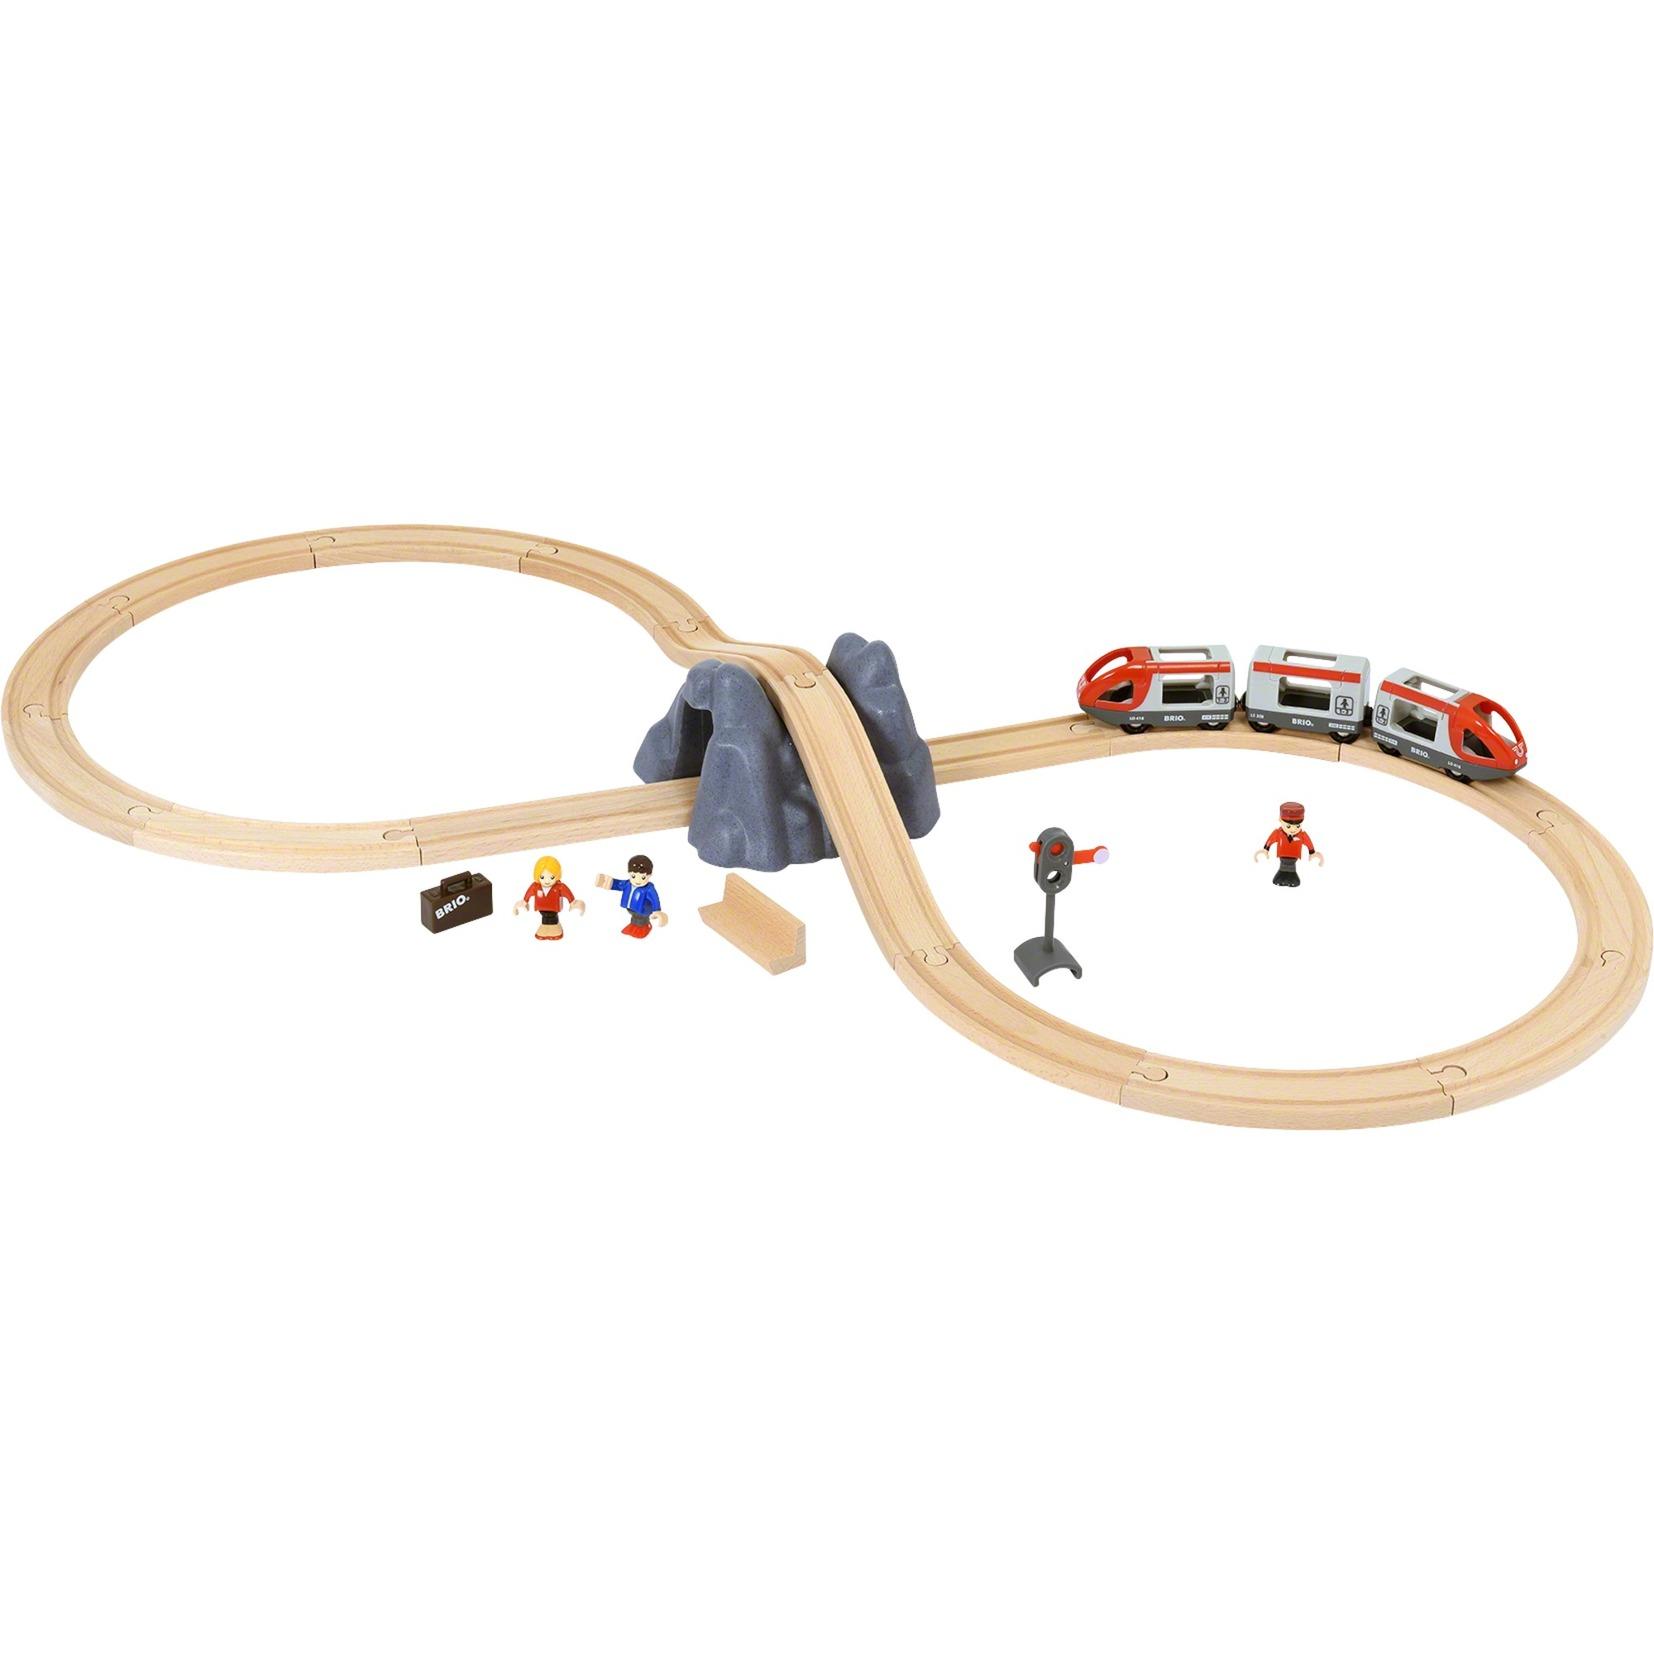 Concept - Circuit, Train